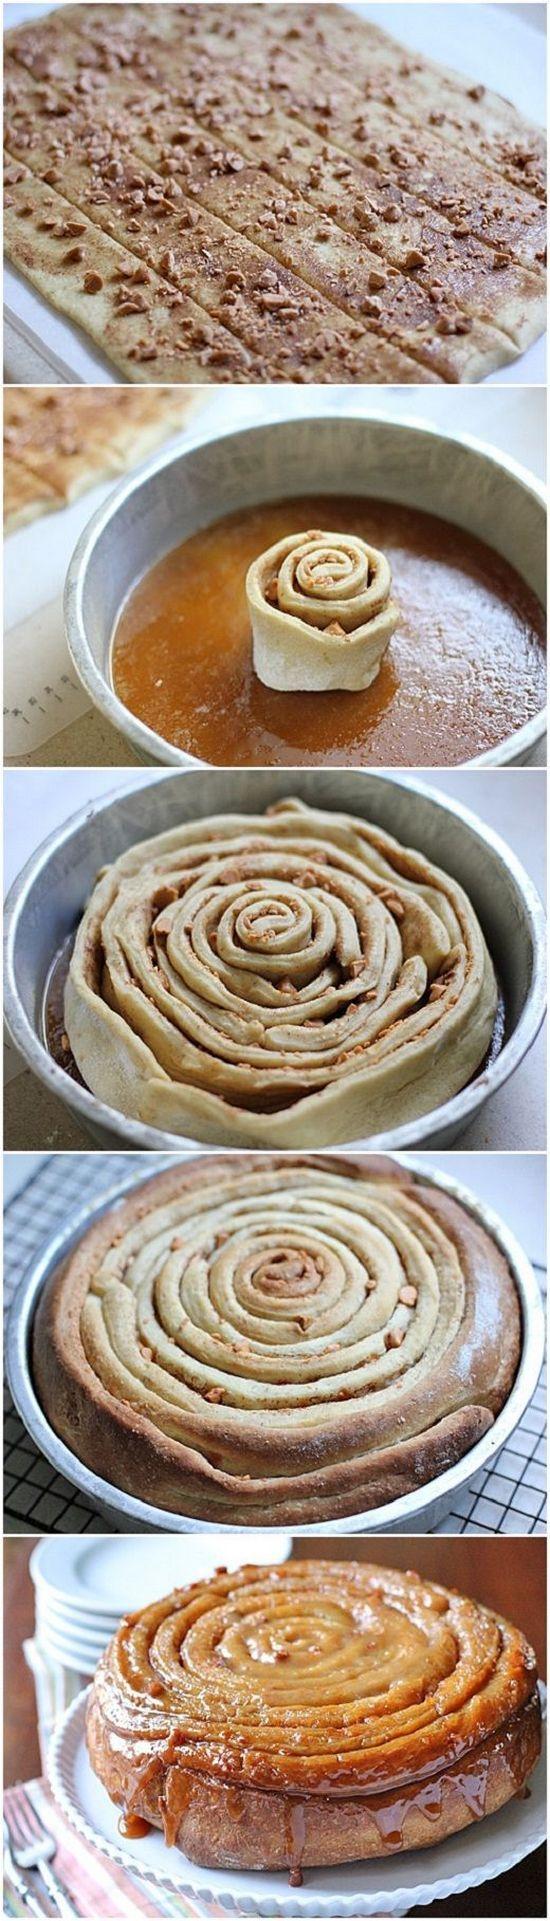 Butterscotch Spiral Coffee Cake